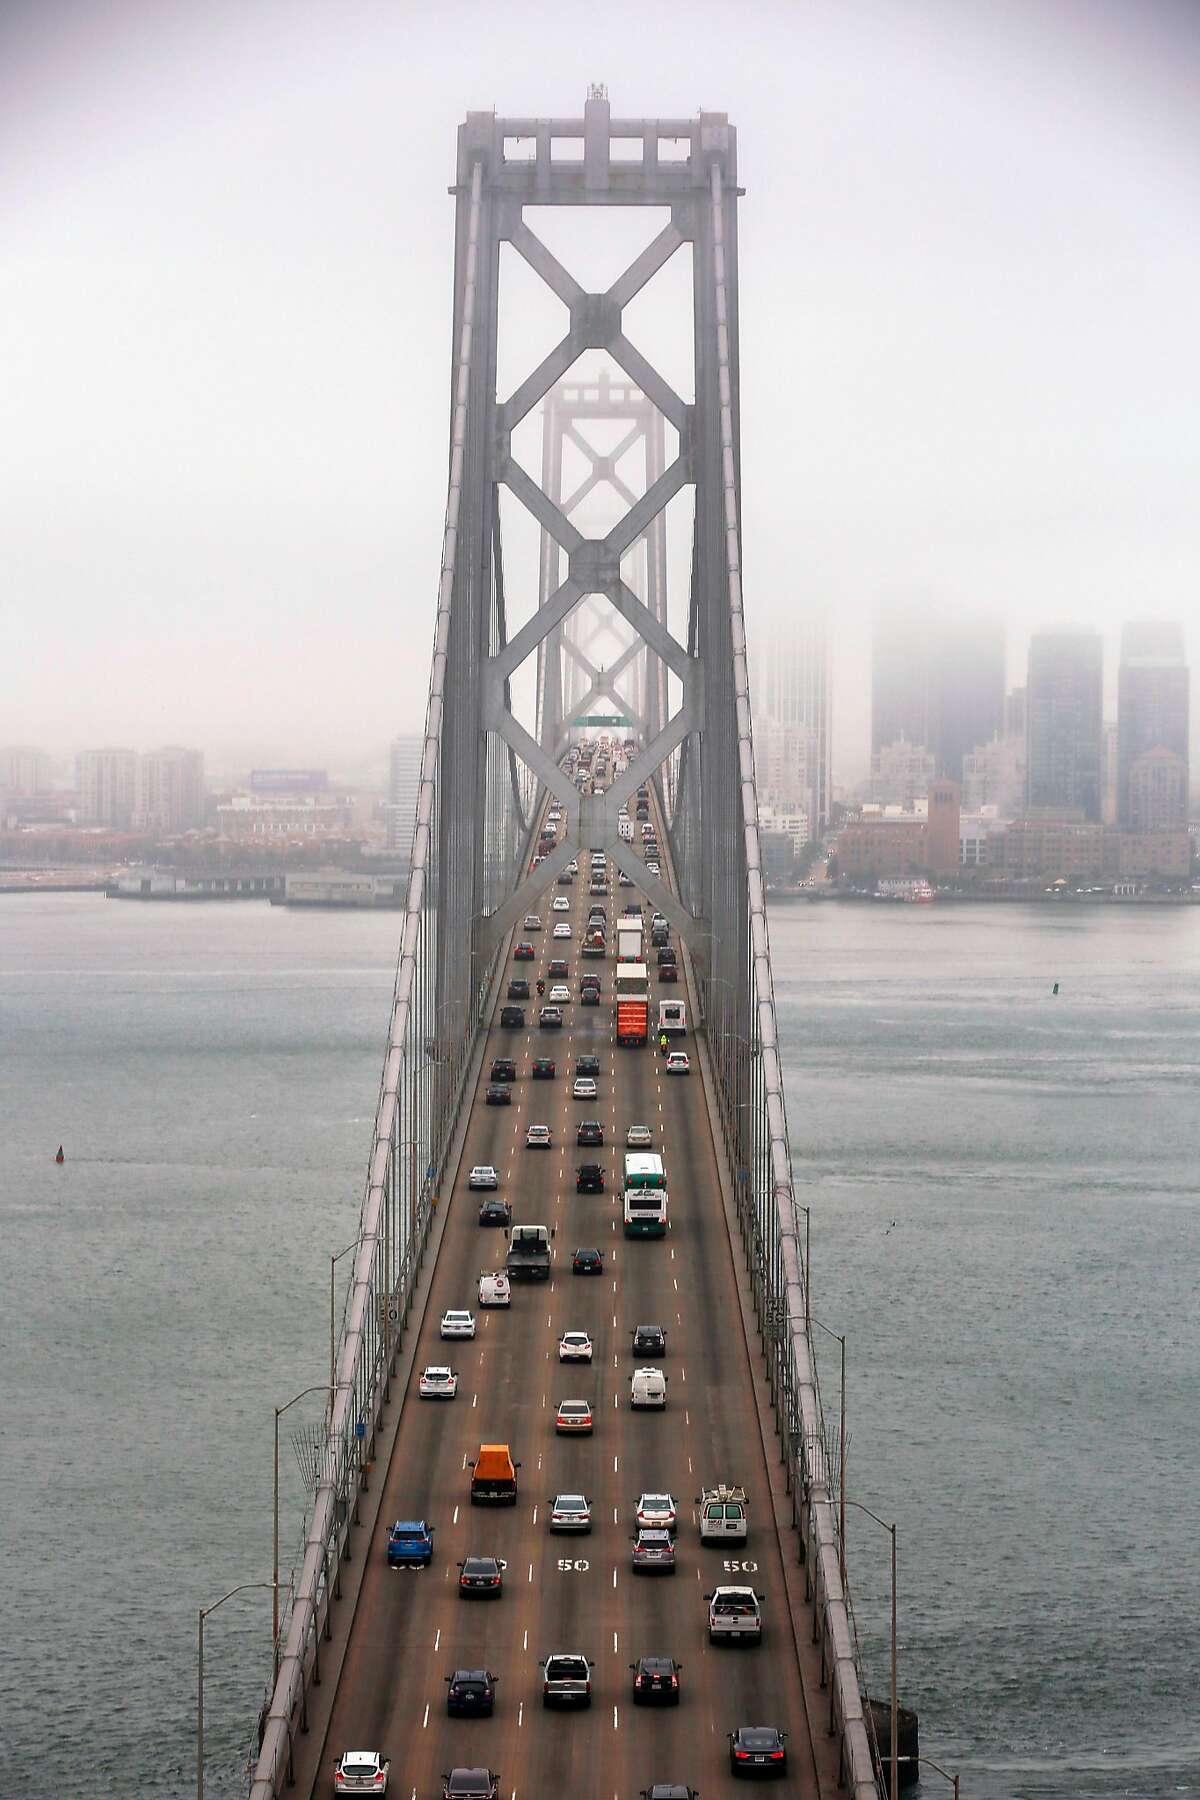 Traffic on the Bay Bridge Monday morning, July 8, 2019, as seen from Yerba Buena Island in San Francisco, Calif.